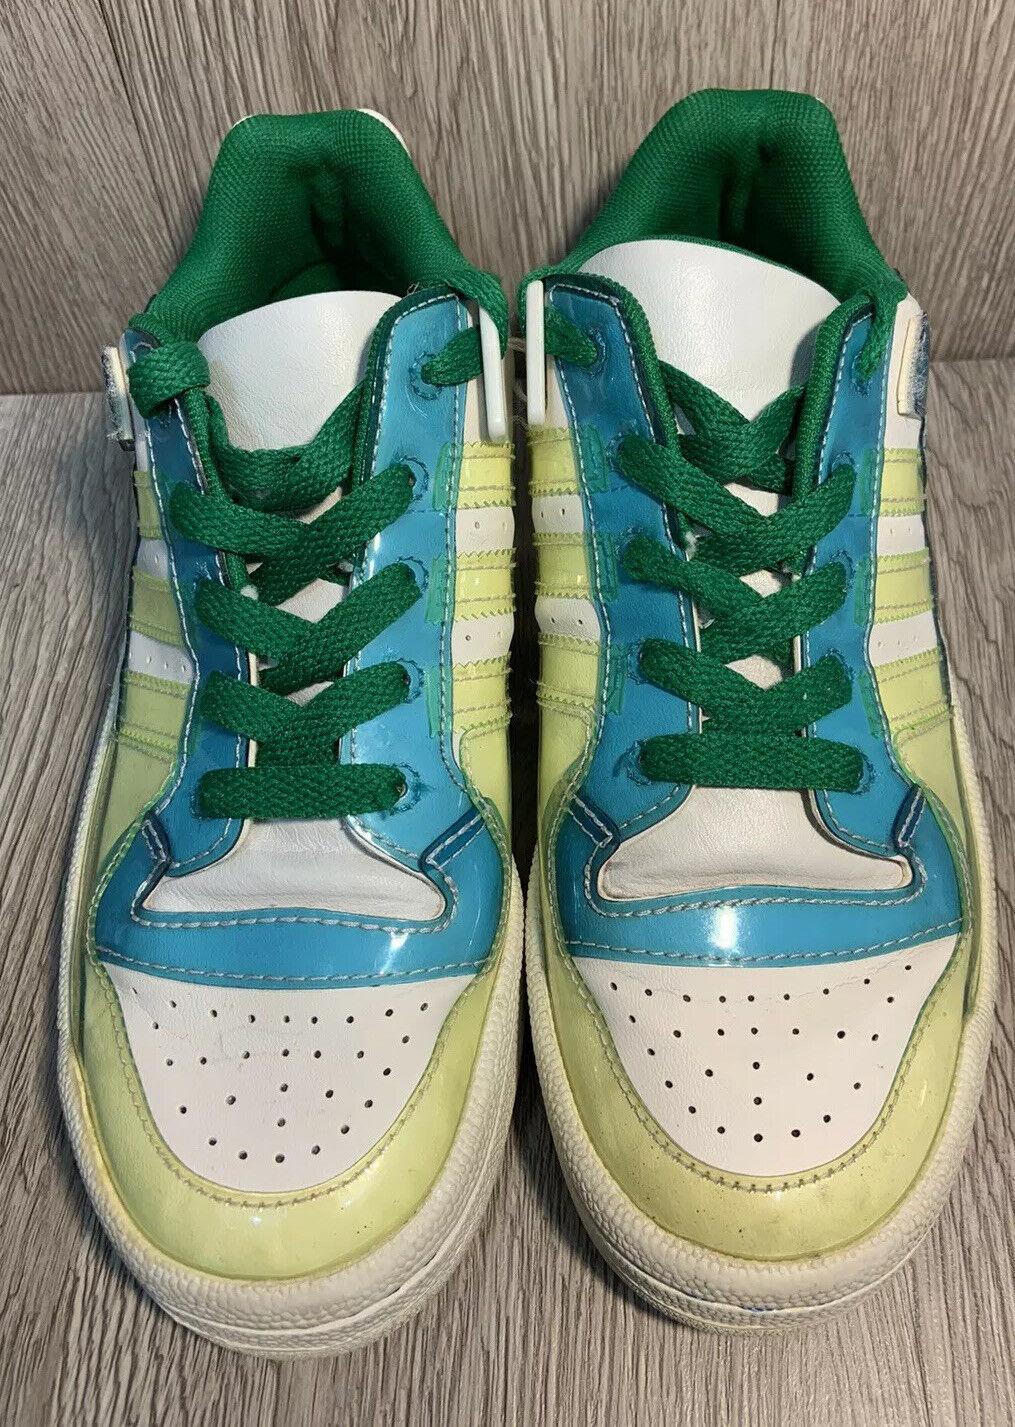 adidas Forum Lo Run Q20629 White Green